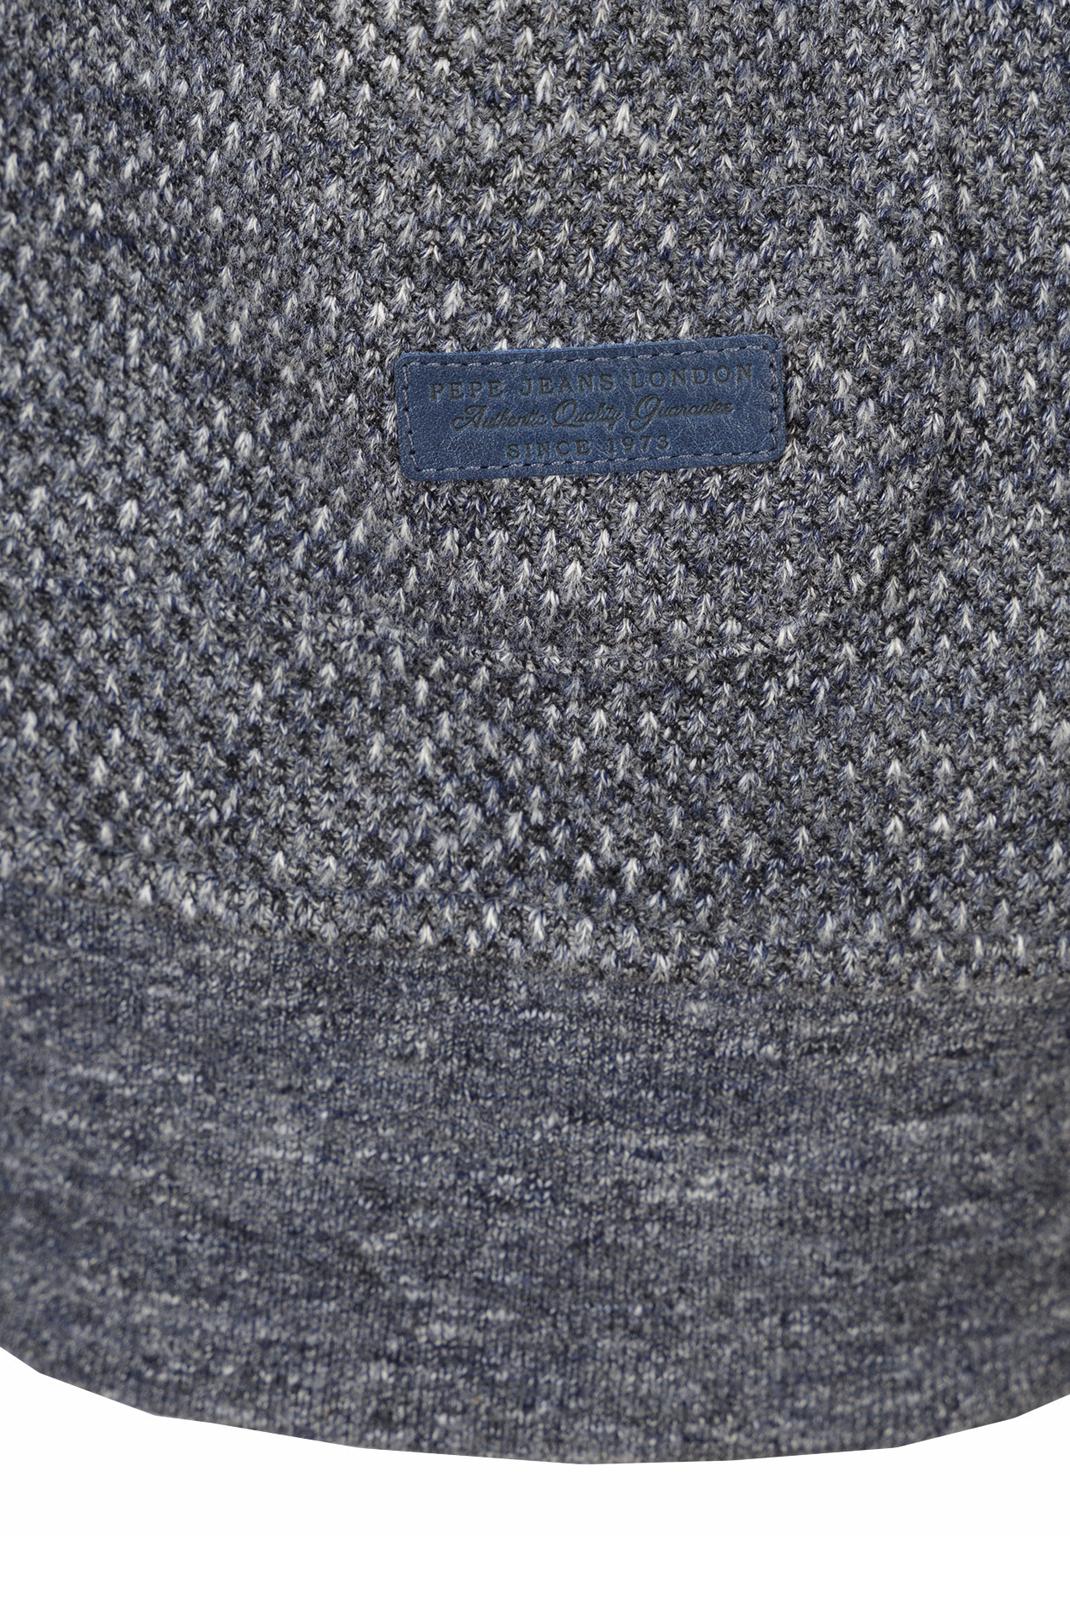 Gilets  Pepe jeans PM580918 590